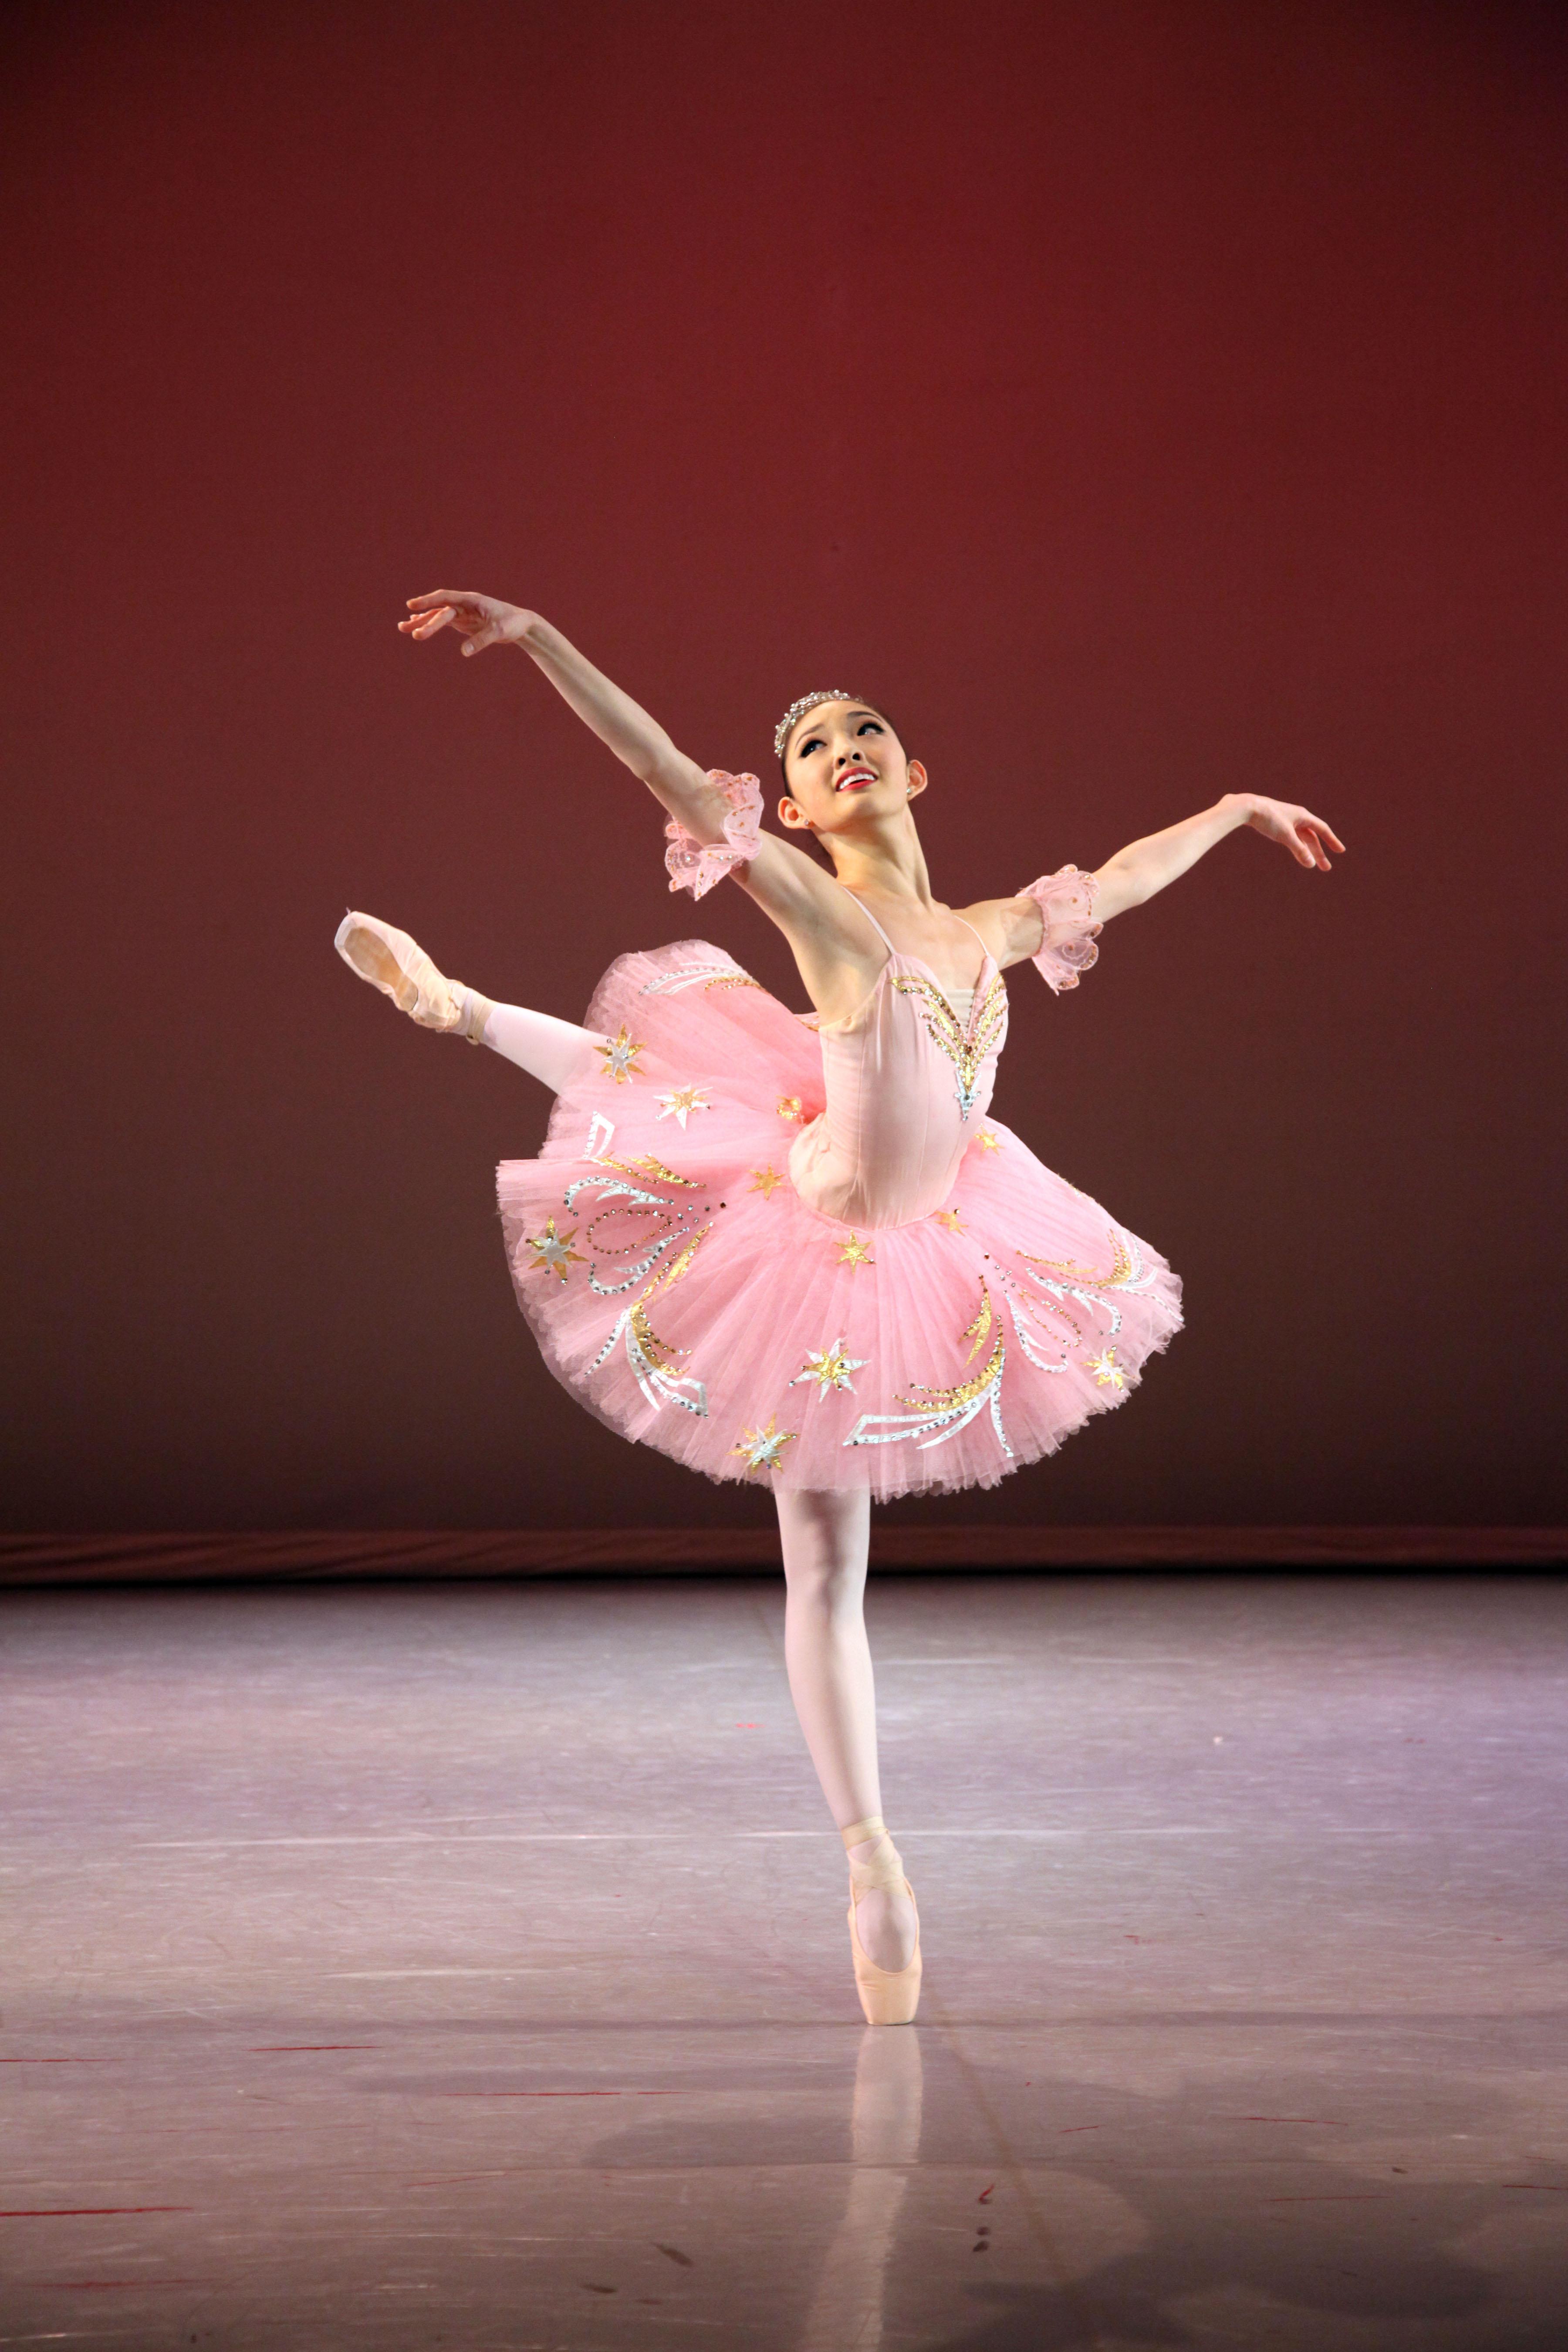 ballet dancers on stage - photo #3